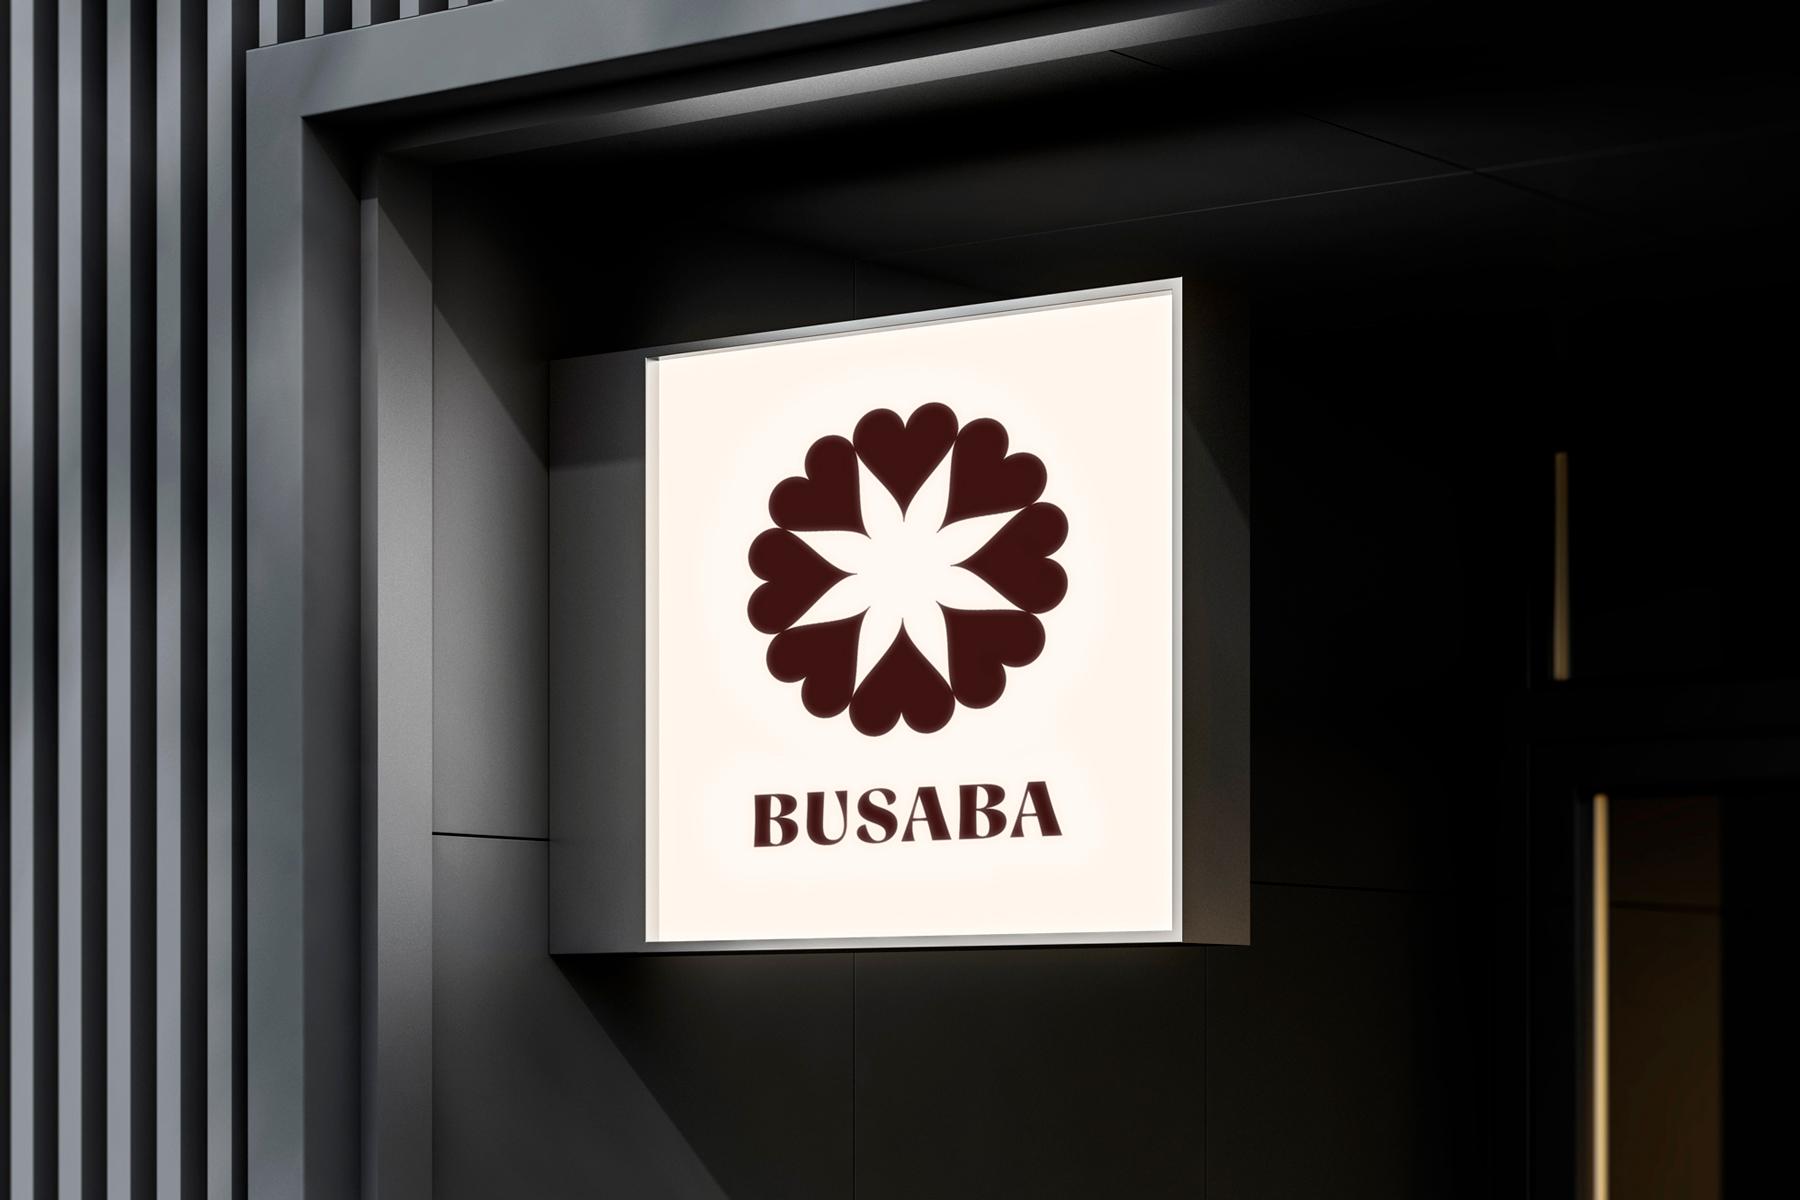 Paul Belford Ltd Creates New Logo for Busaba in Thai Restaurant Rebrand